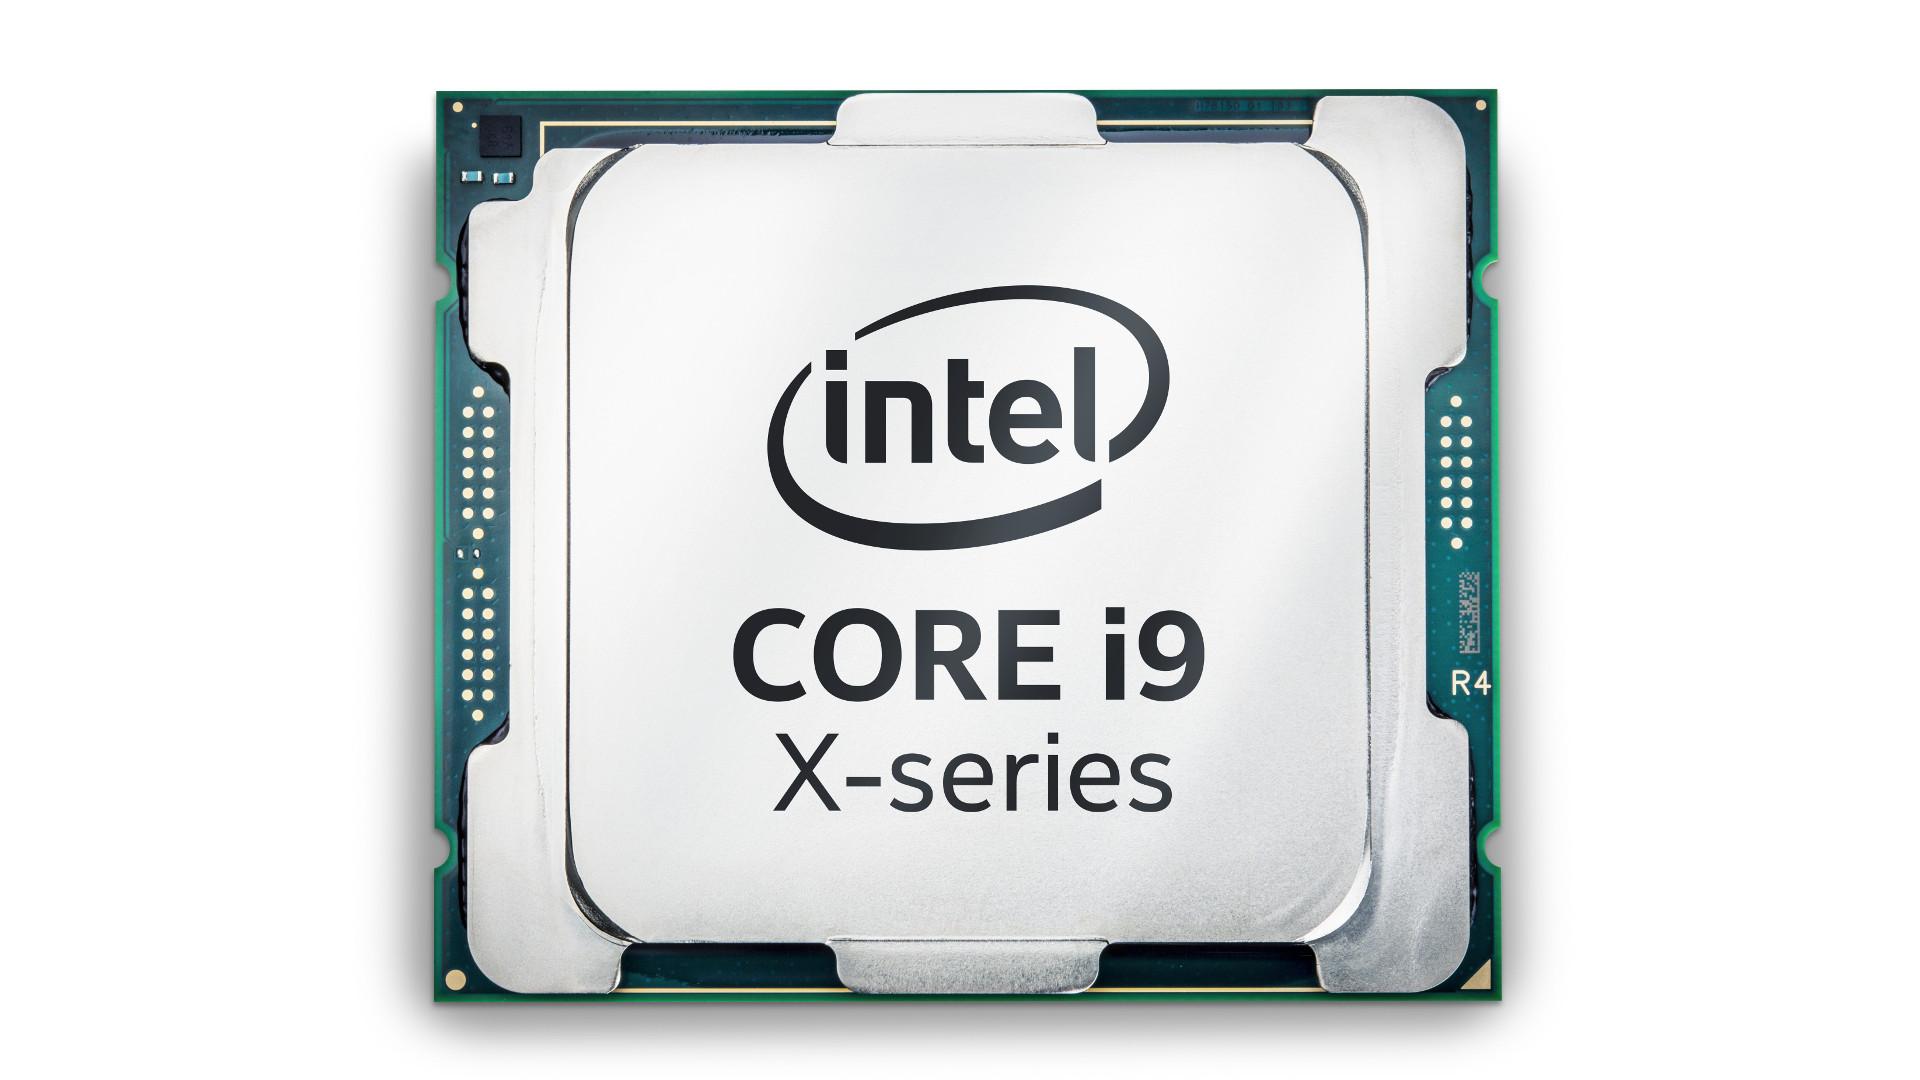 Превосходство Intel Core i9-9900K в играх над AMD Ryzen 7 2700X не такое очевидное, как предполагалось (тесты)